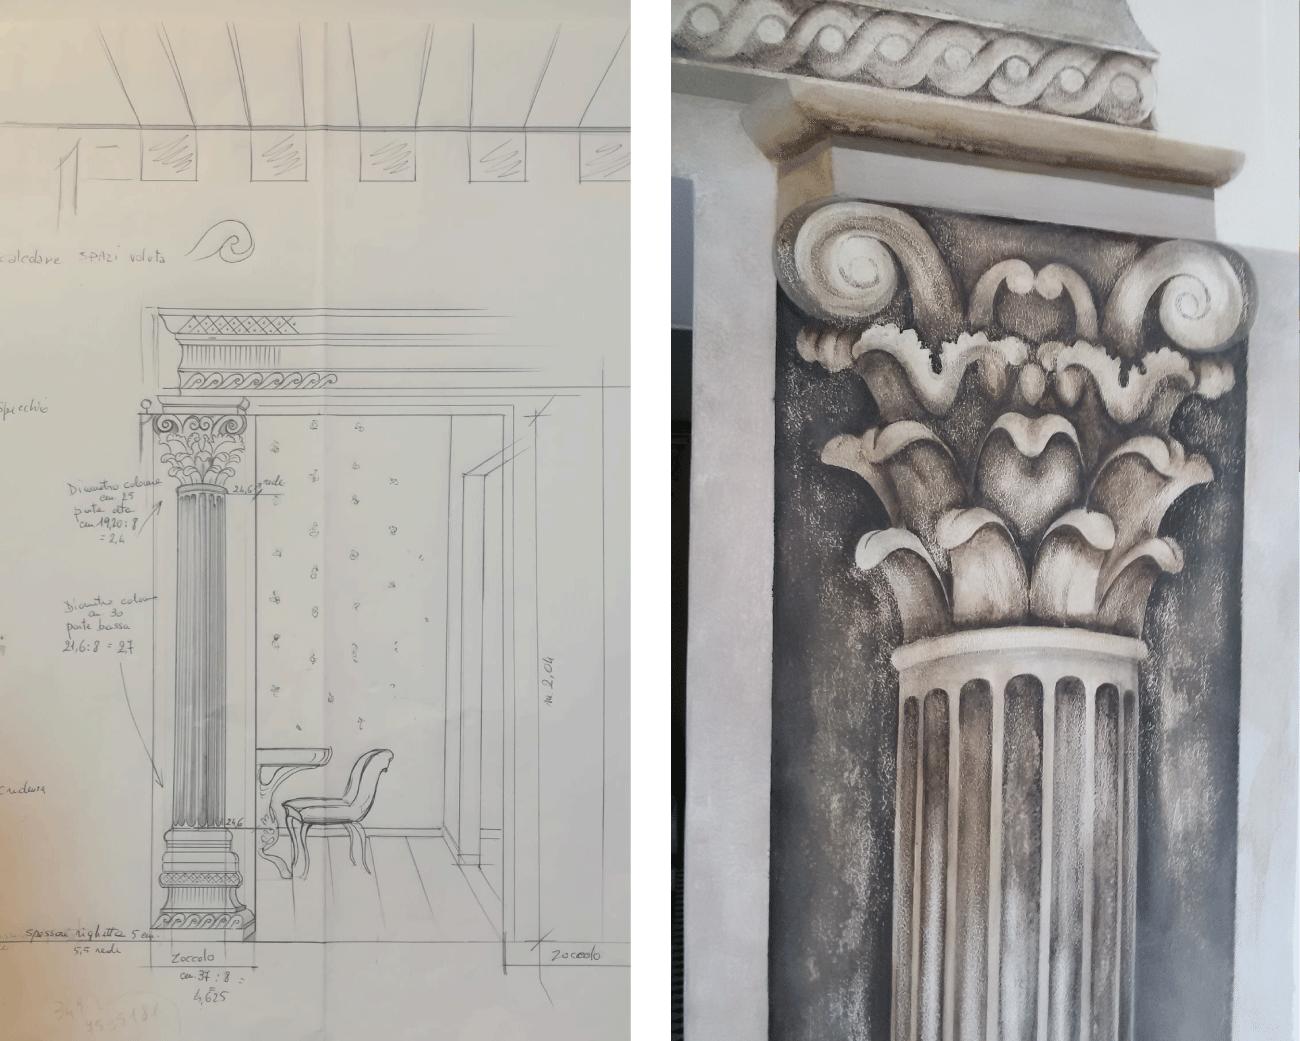 colonne-corinzie-bacheca